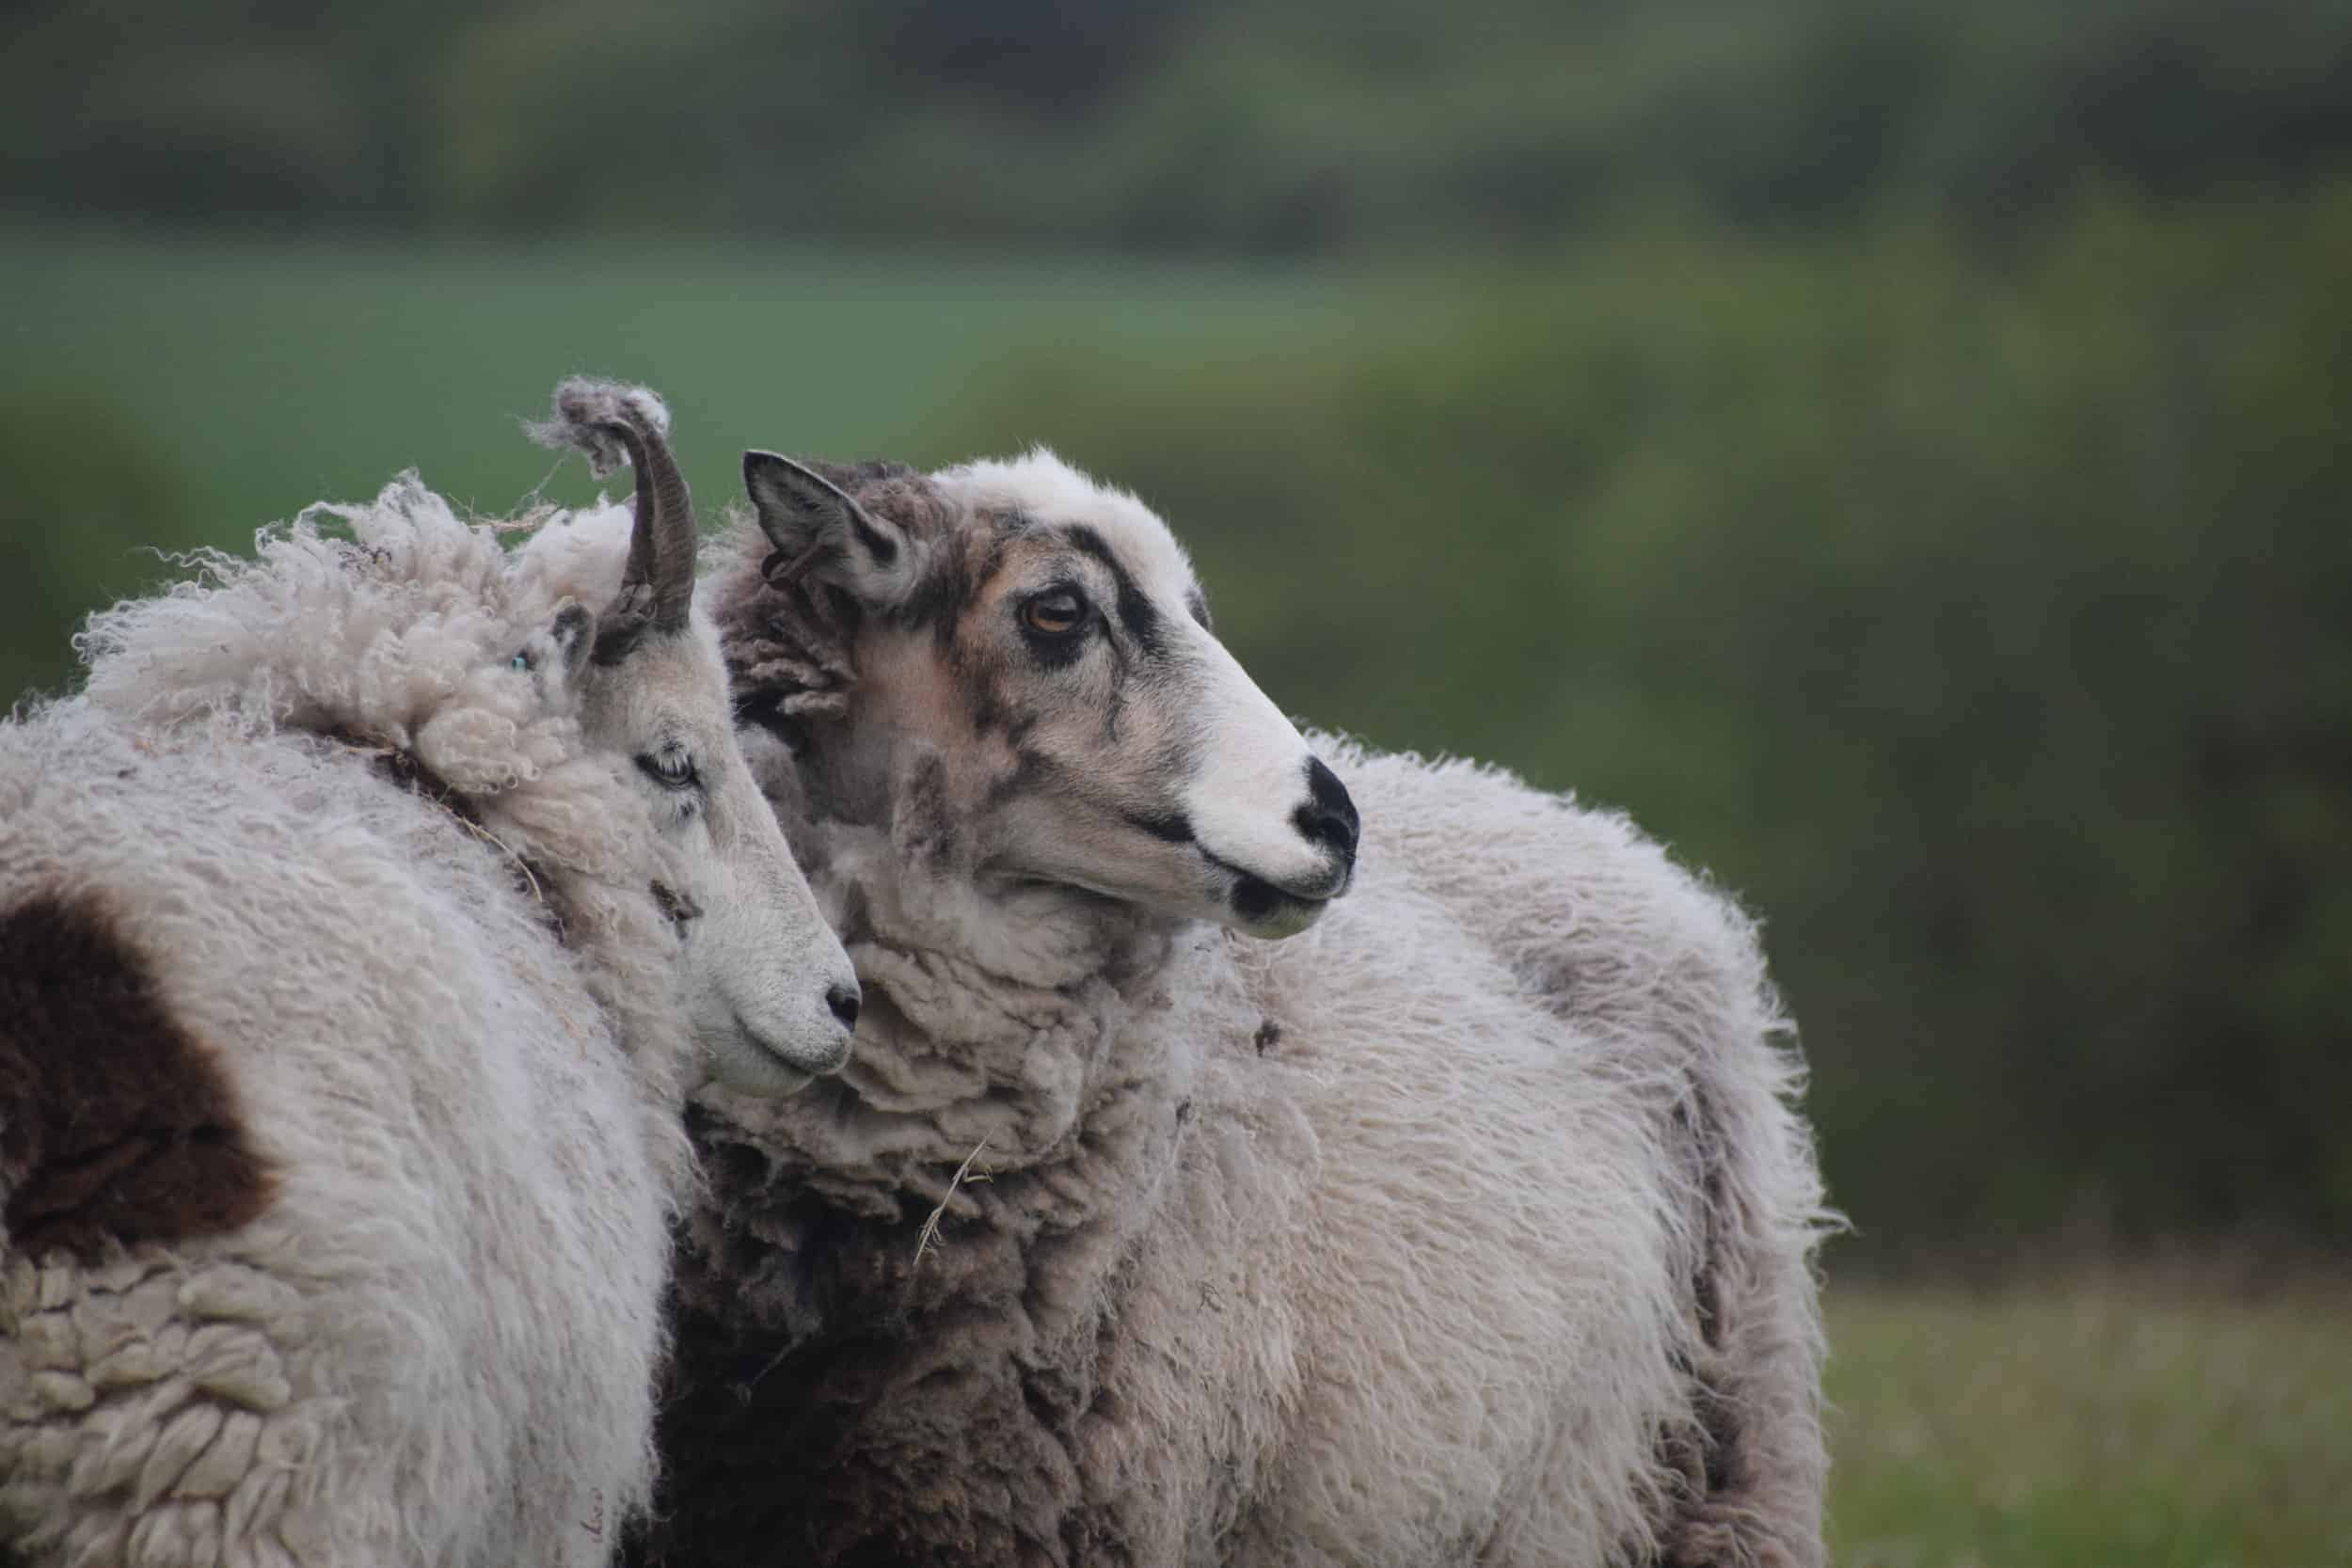 patchwork sheep smudge patch primitivecute lamb golden soay cross shetland jacob sheep